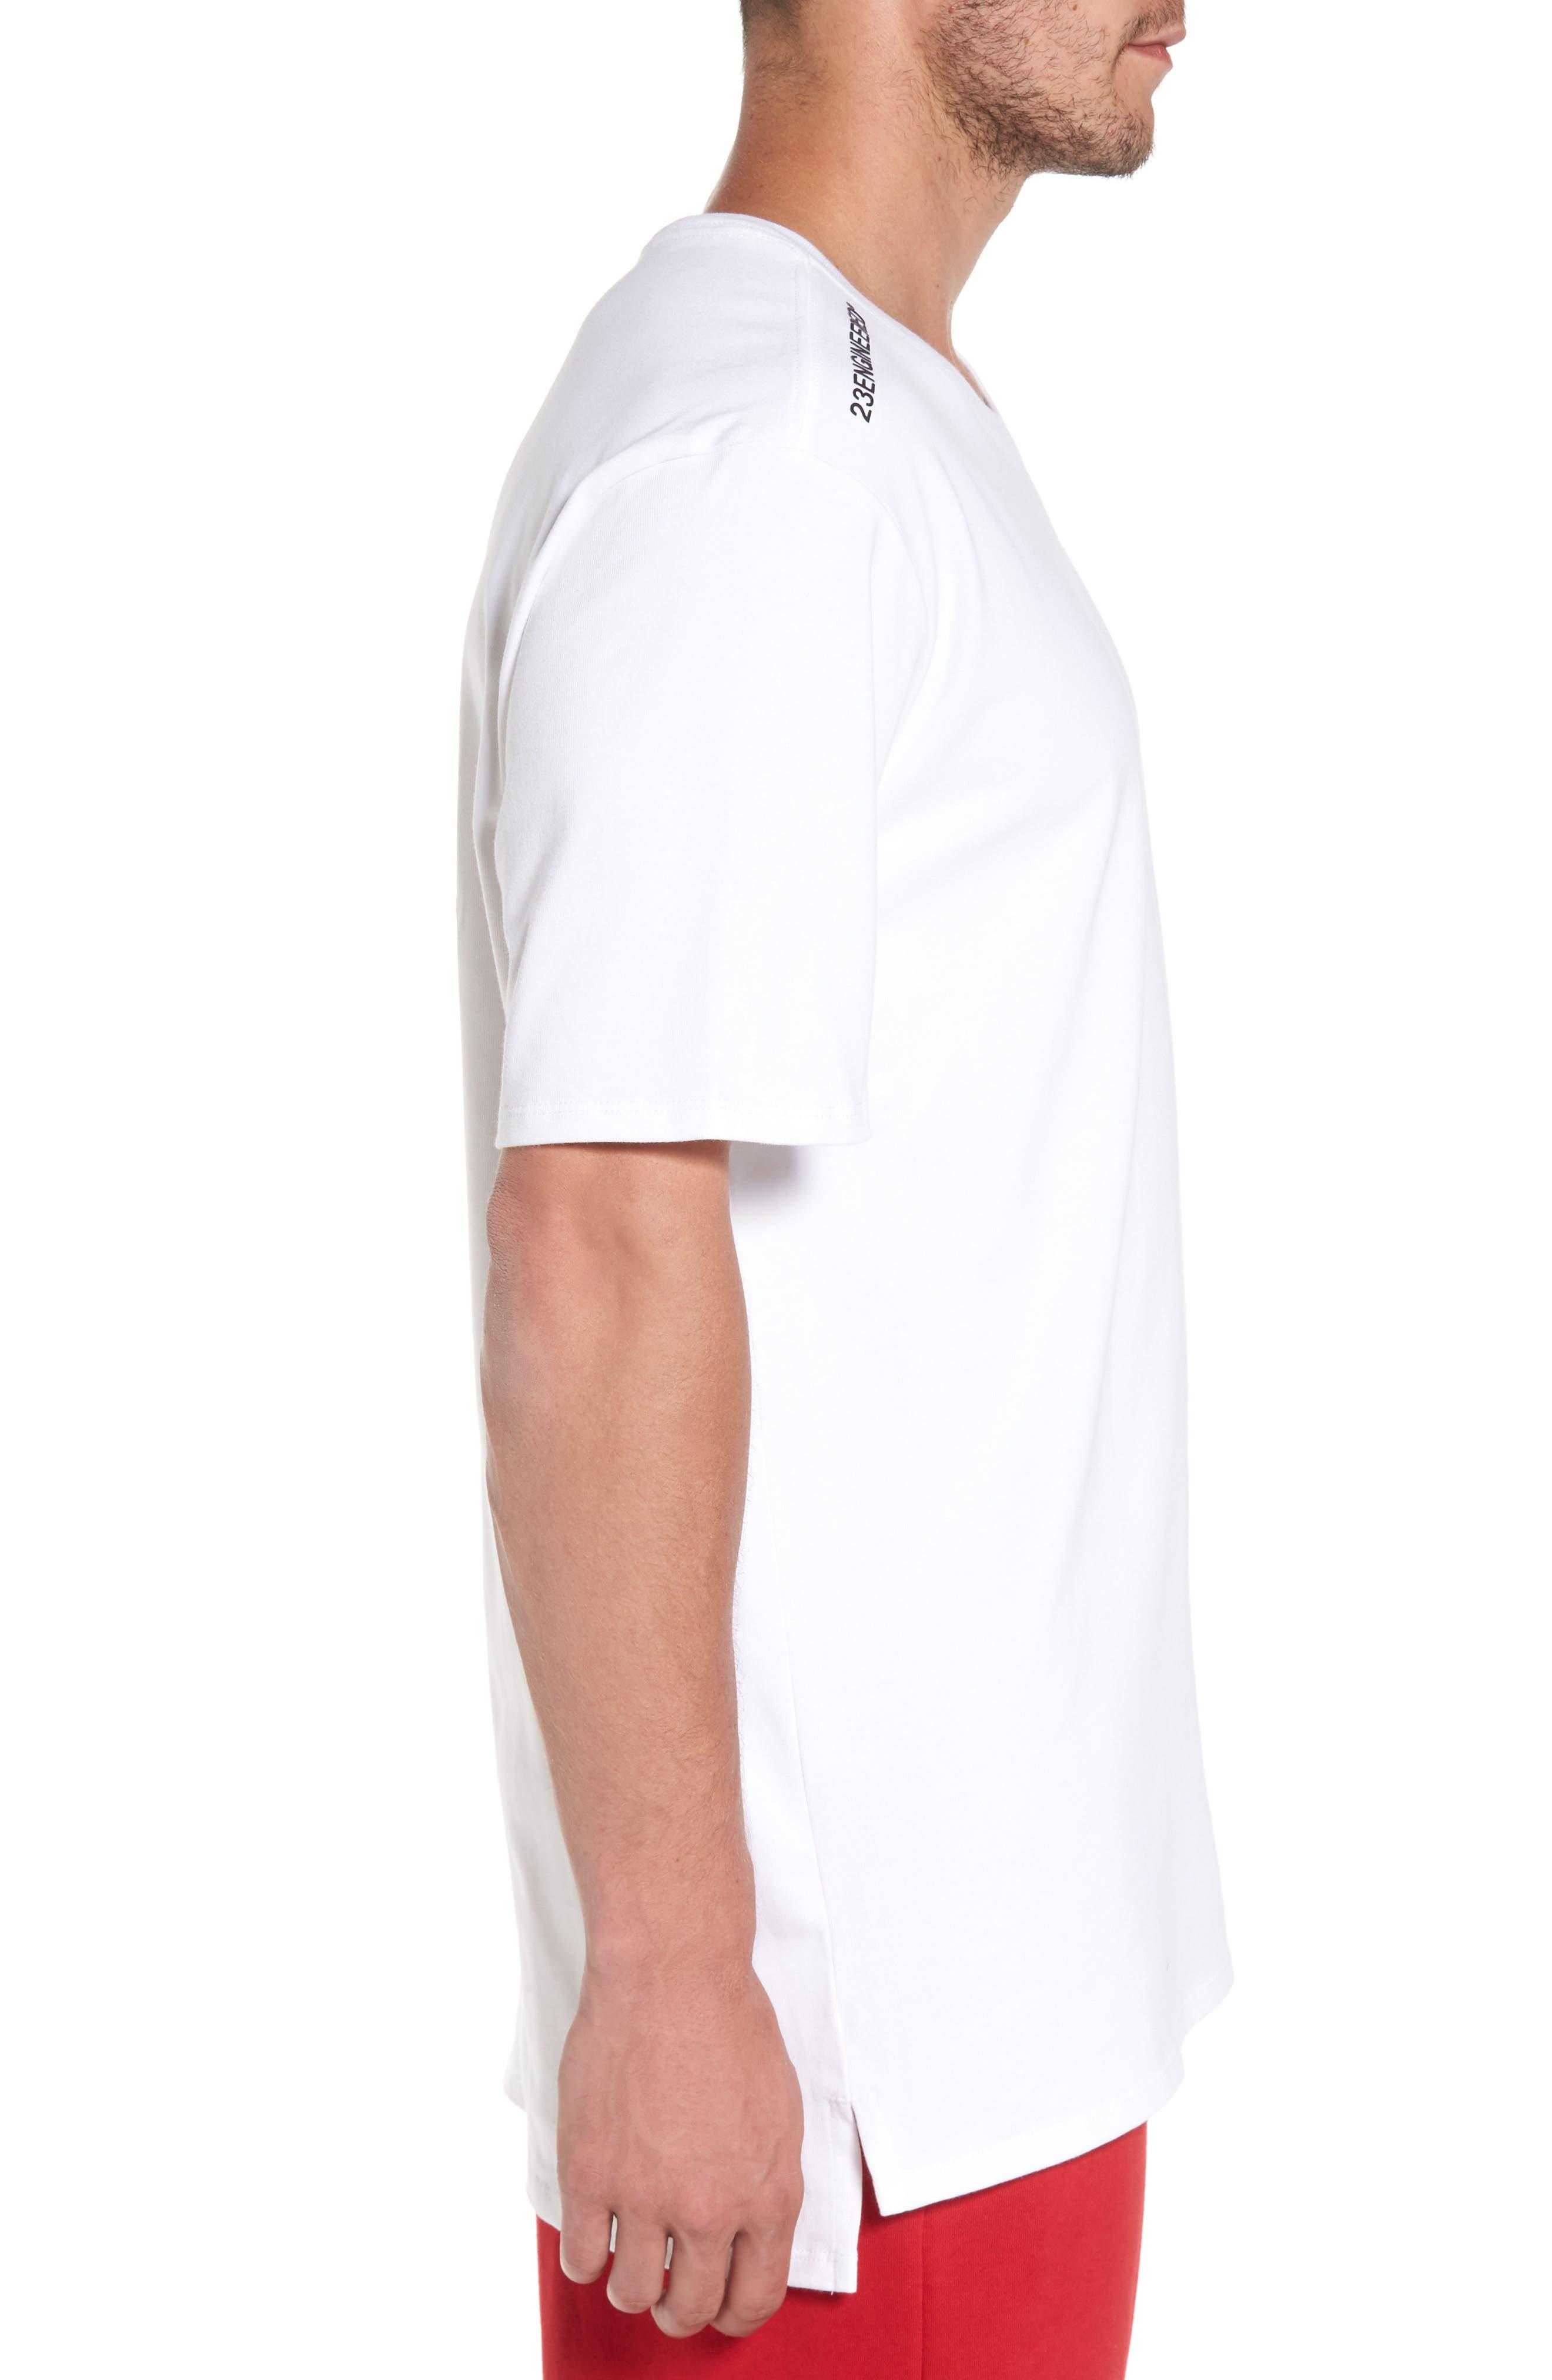 Sportswear 23 Engineered T-Shirt,                             Alternate thumbnail 3, color,                             White/ Black